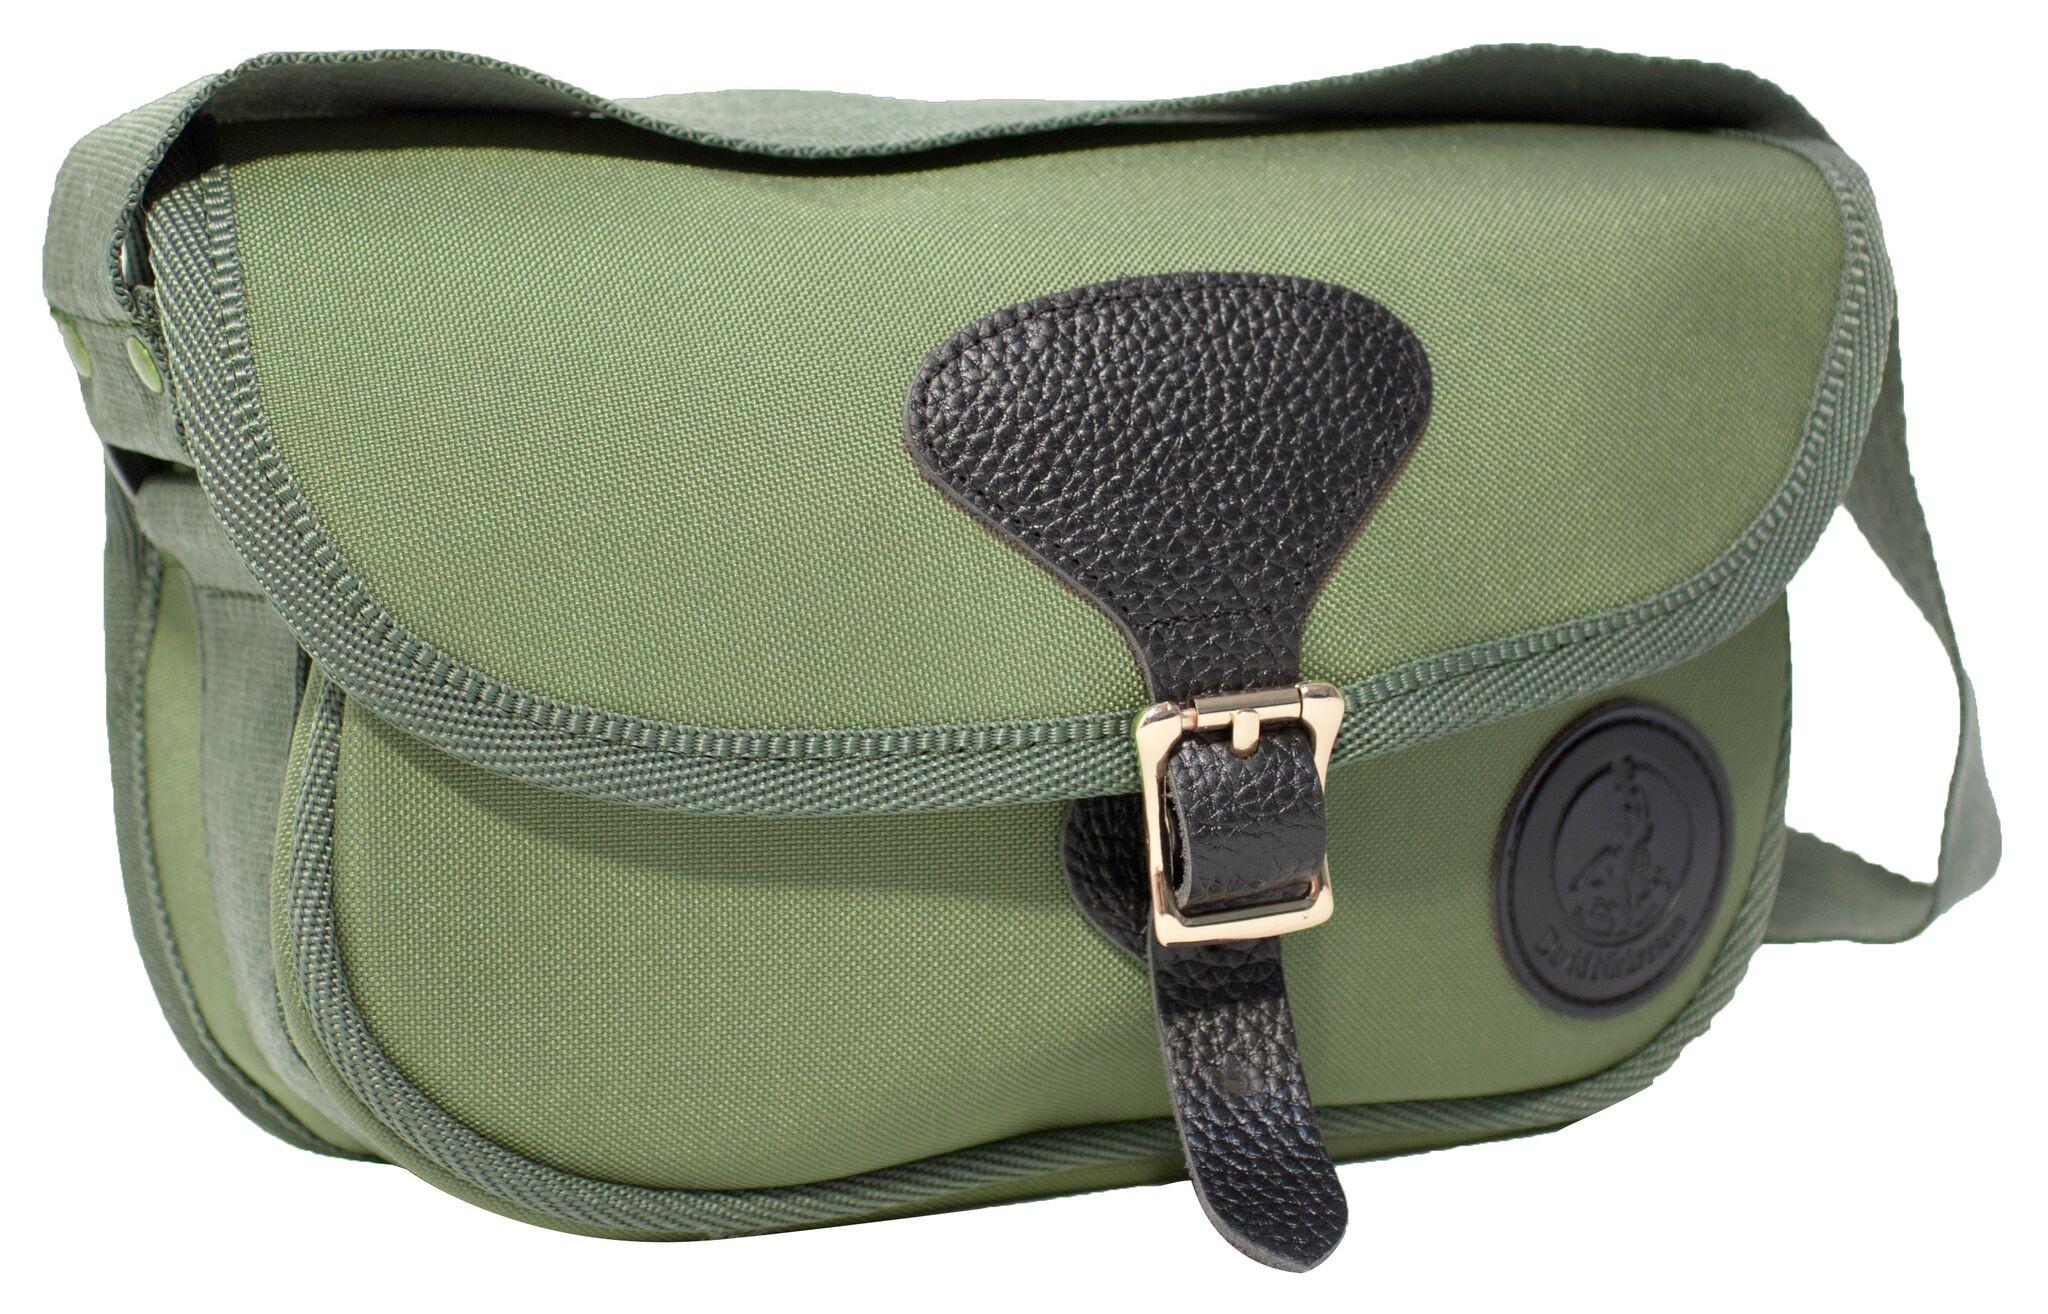 David Nickerson Canvas Cartridge Bag. - Balnecroft Country Clothing